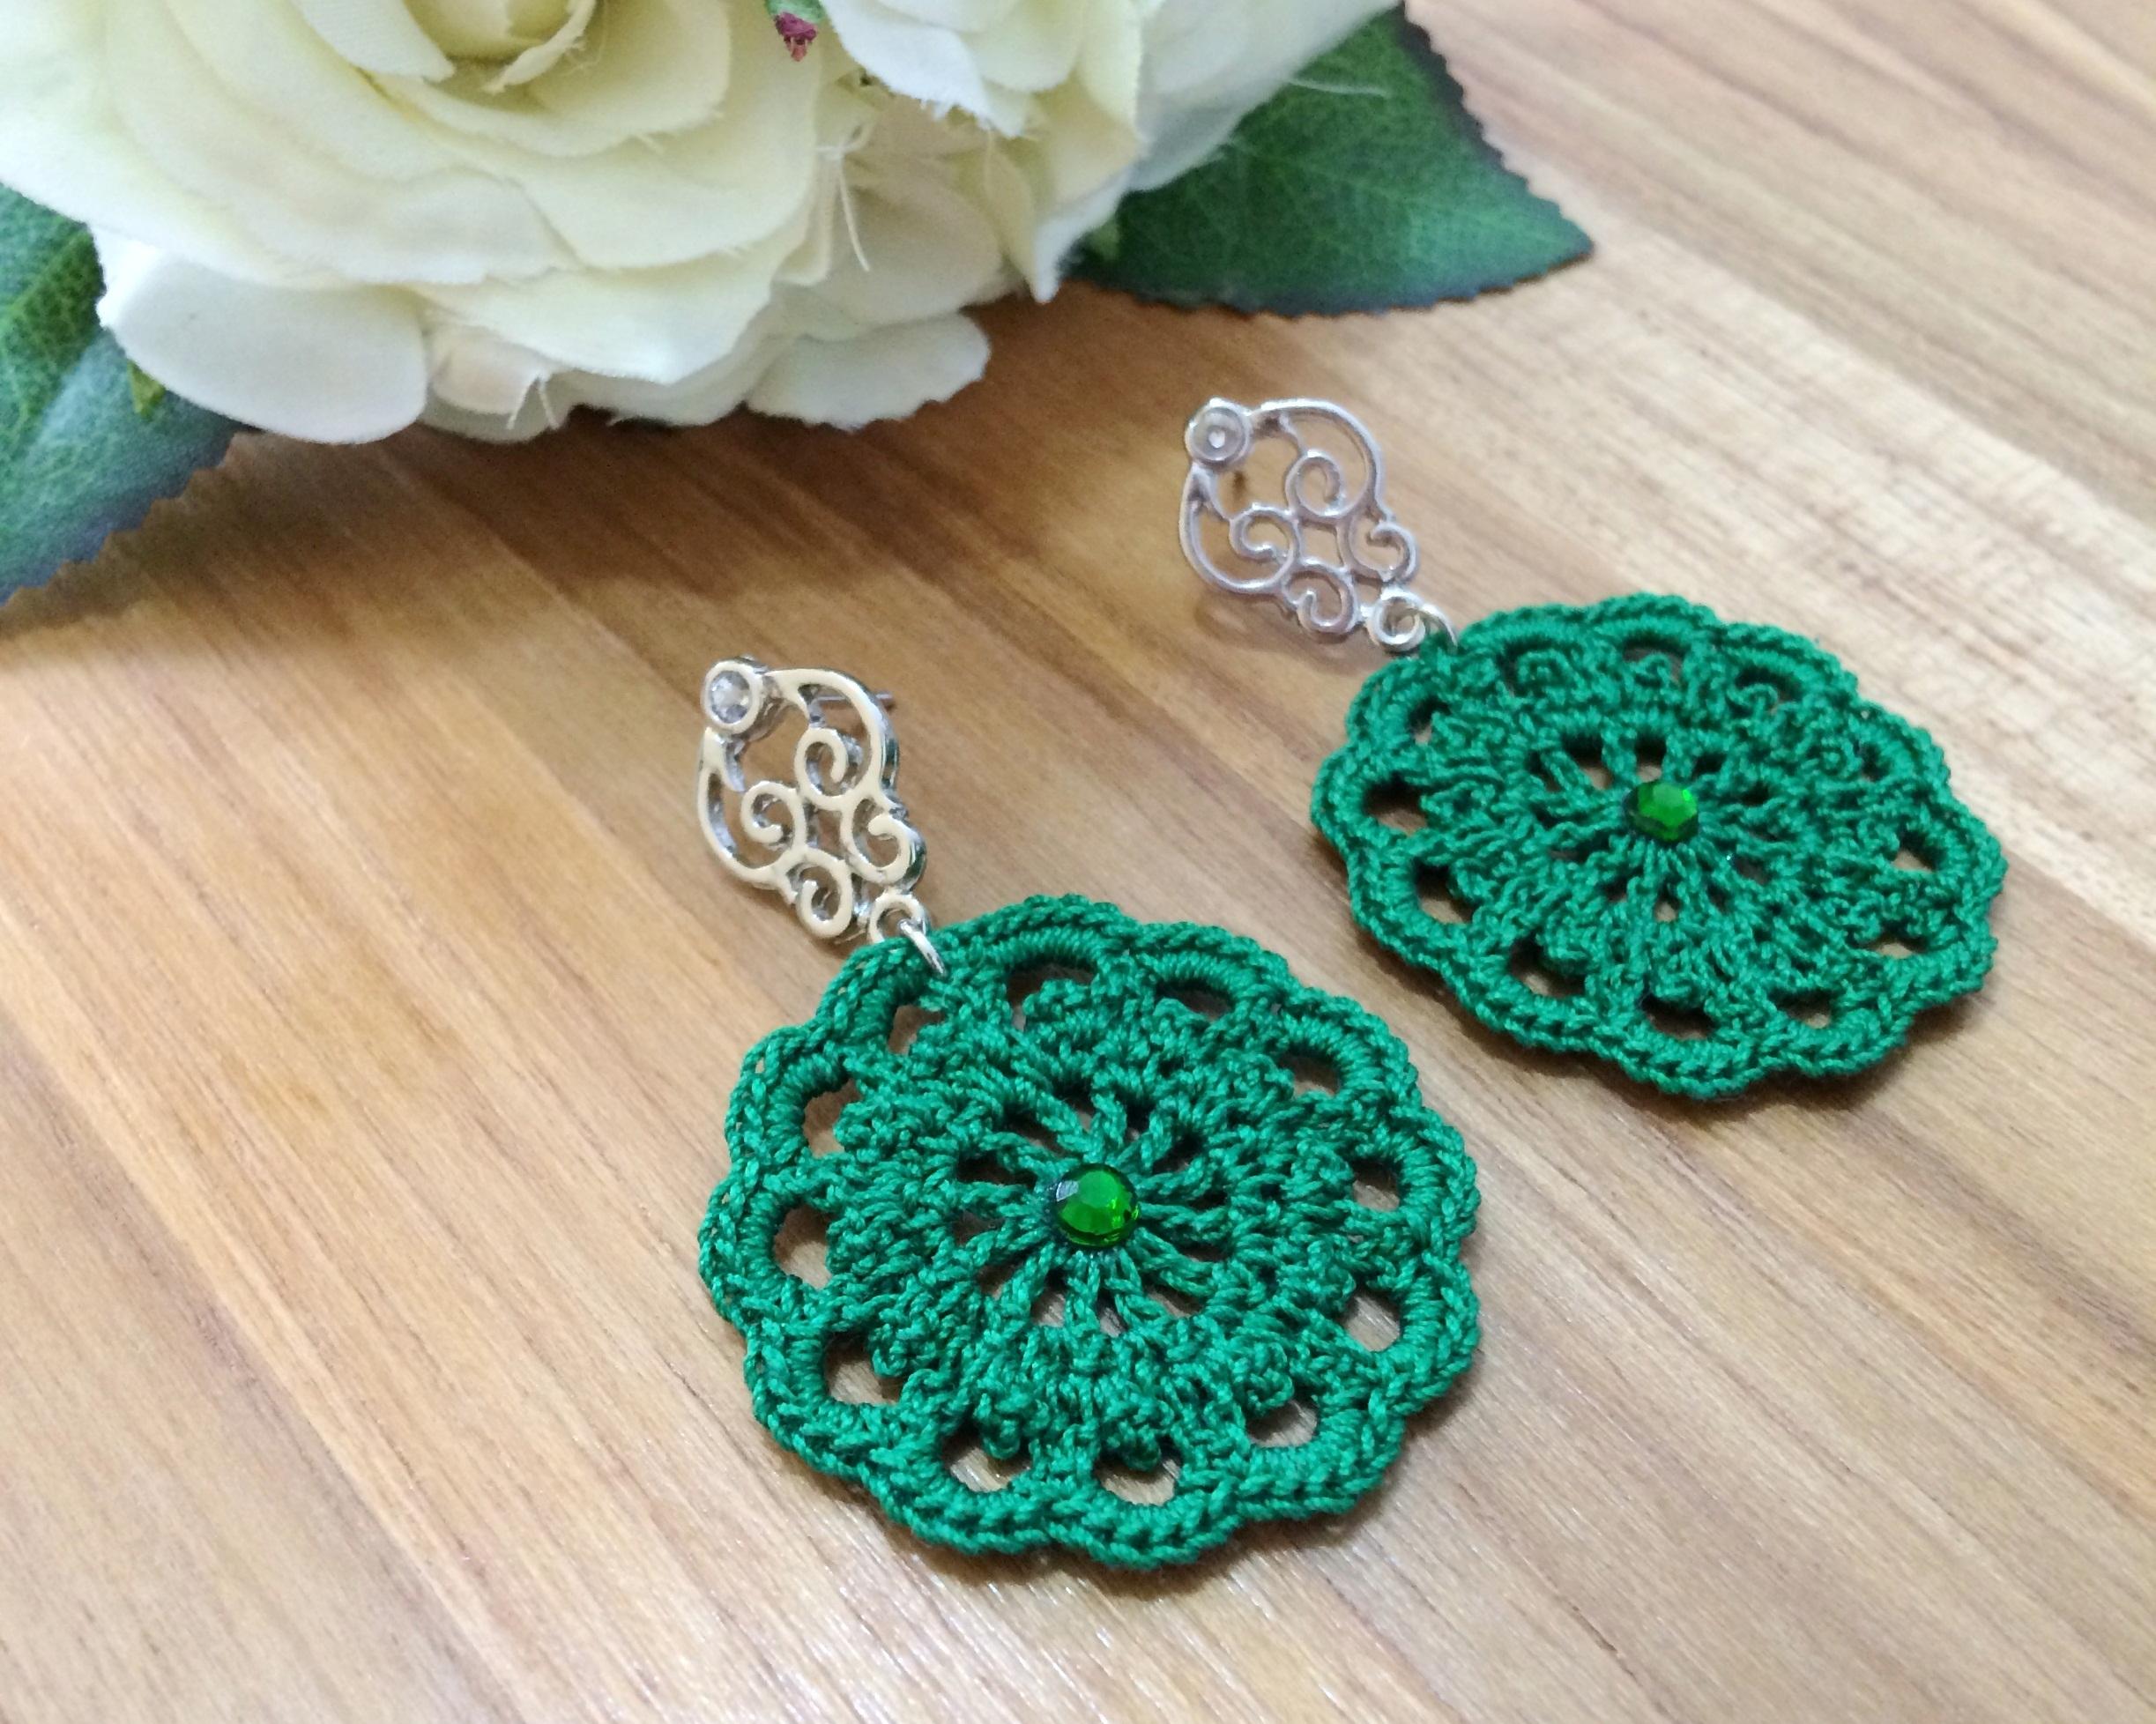 30 Crochet Earring Patterns - The Funky Stitch